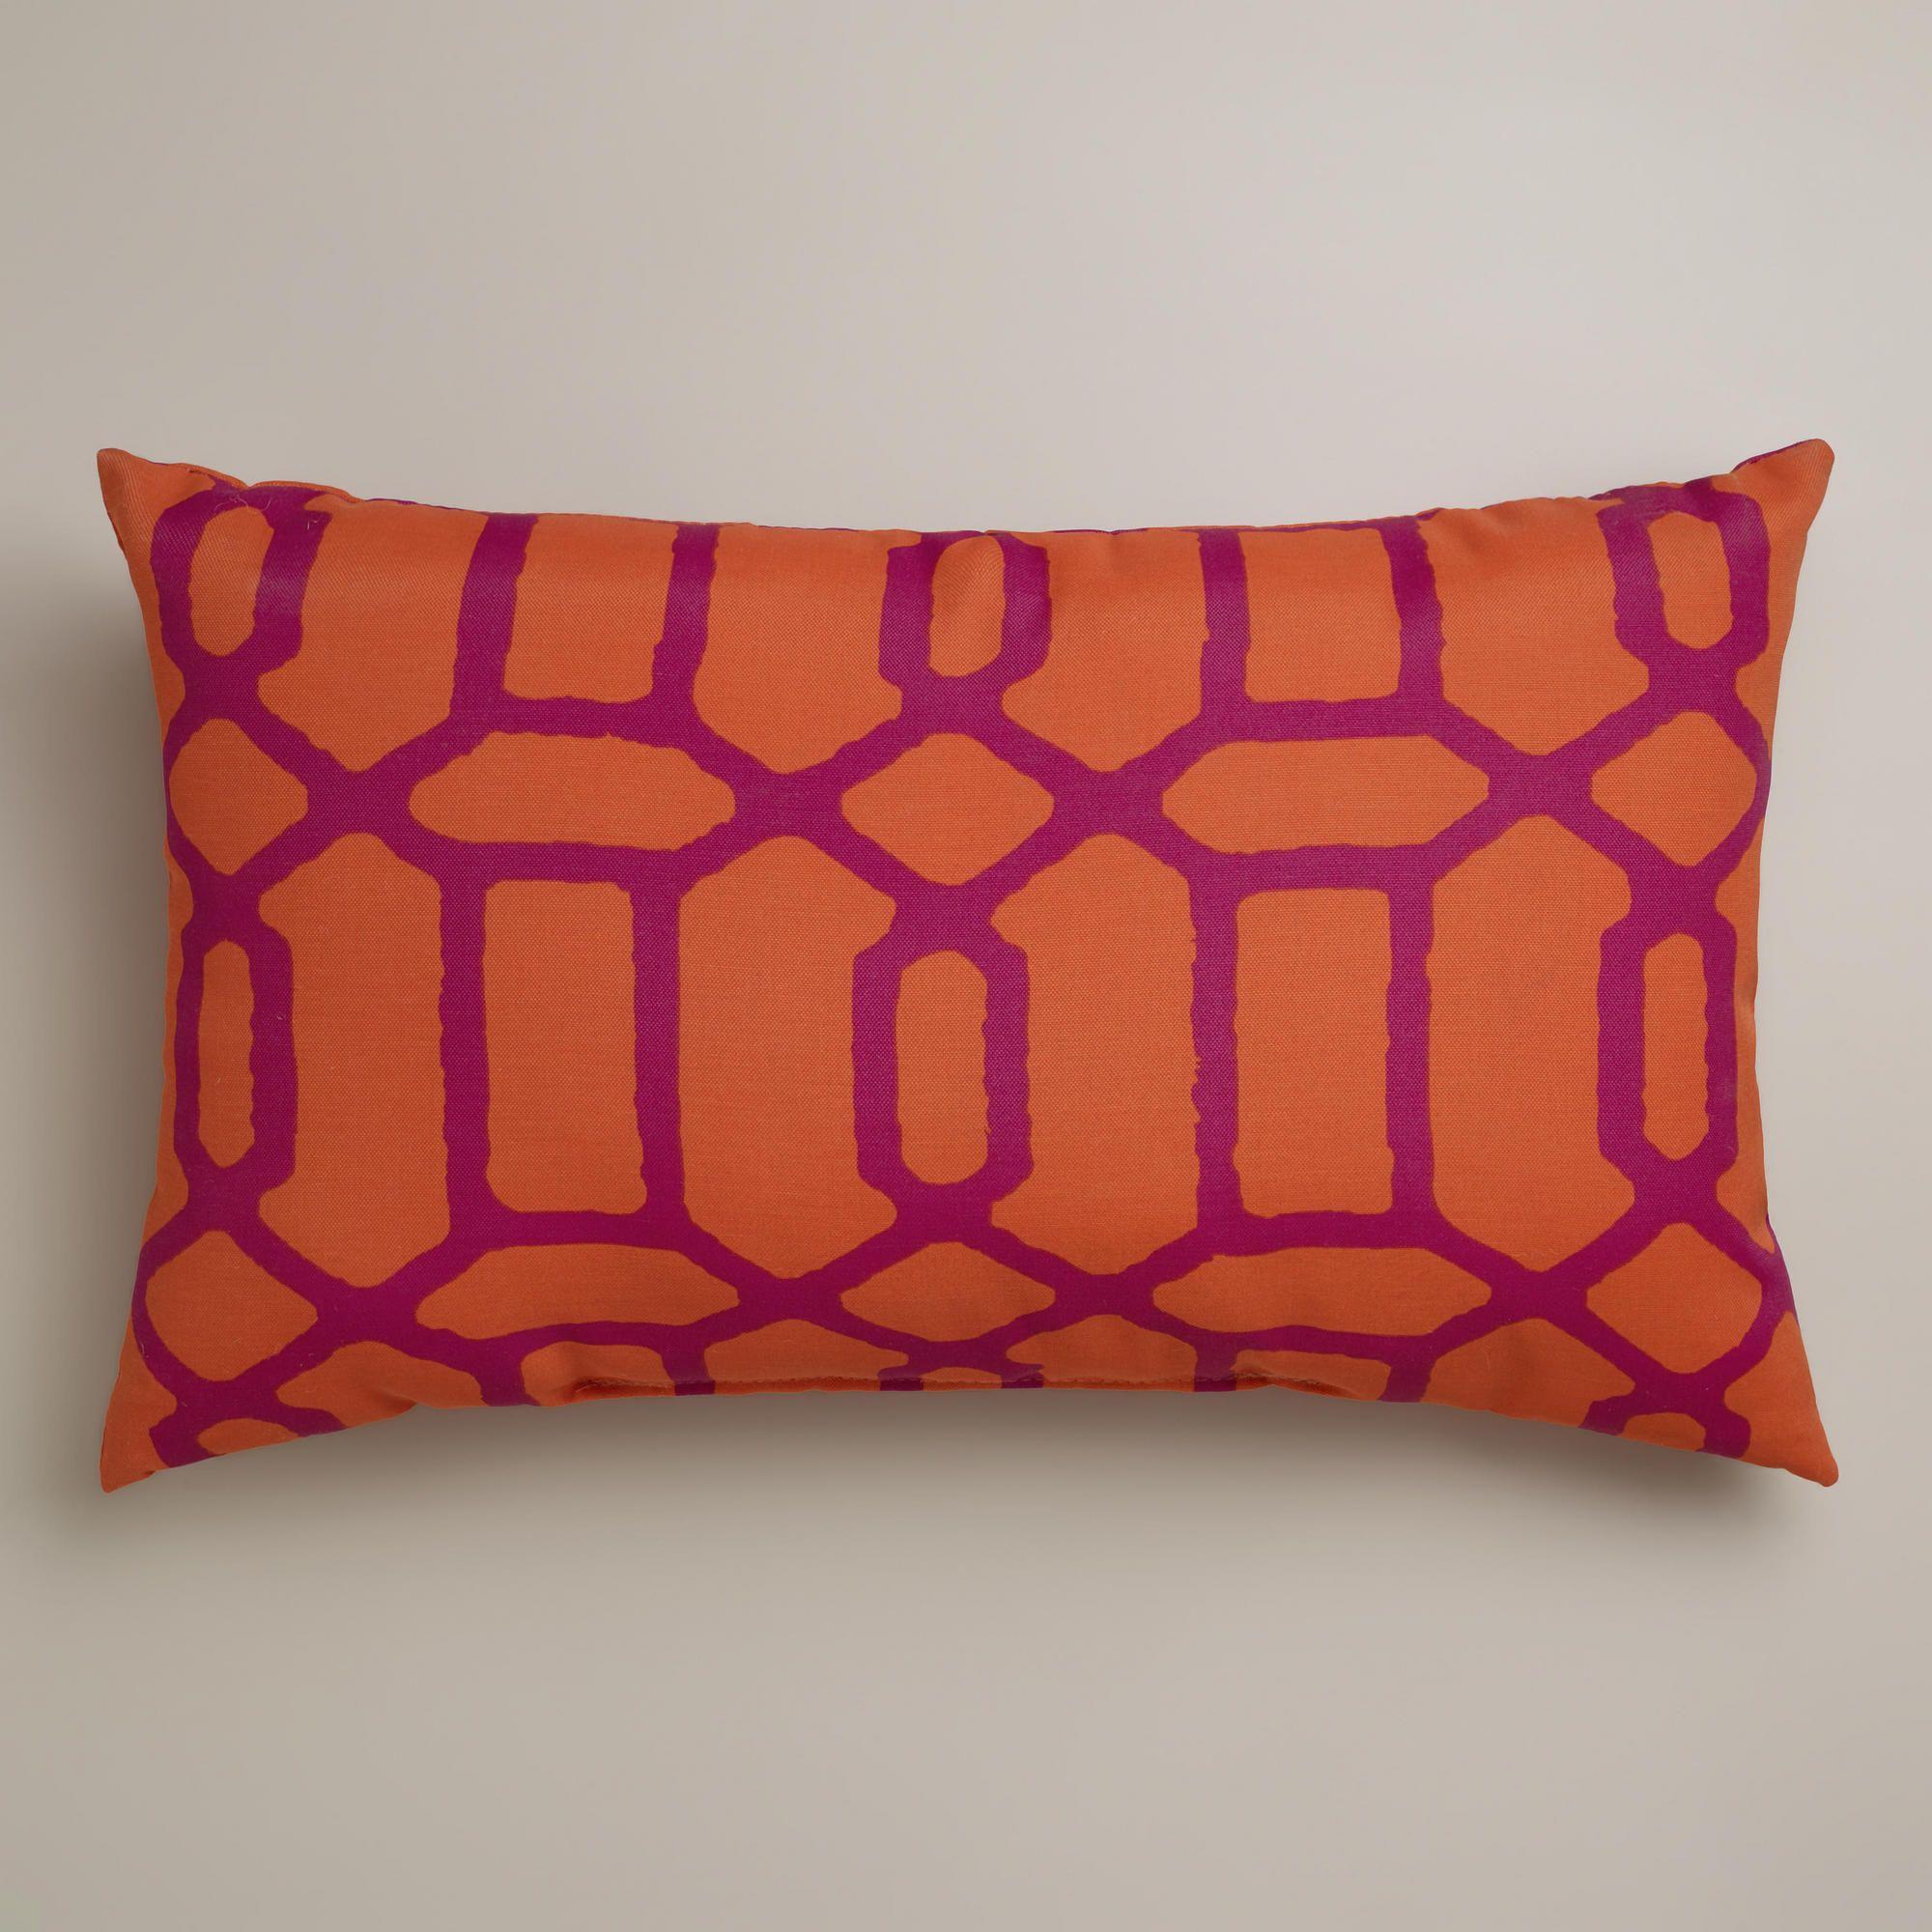 perfect living stewart decorative martha pillow pillows sunbrella ideas com canada lumbar blue design marvelous bloom and throw on sale lowes full outdoor cheap amazon cushions